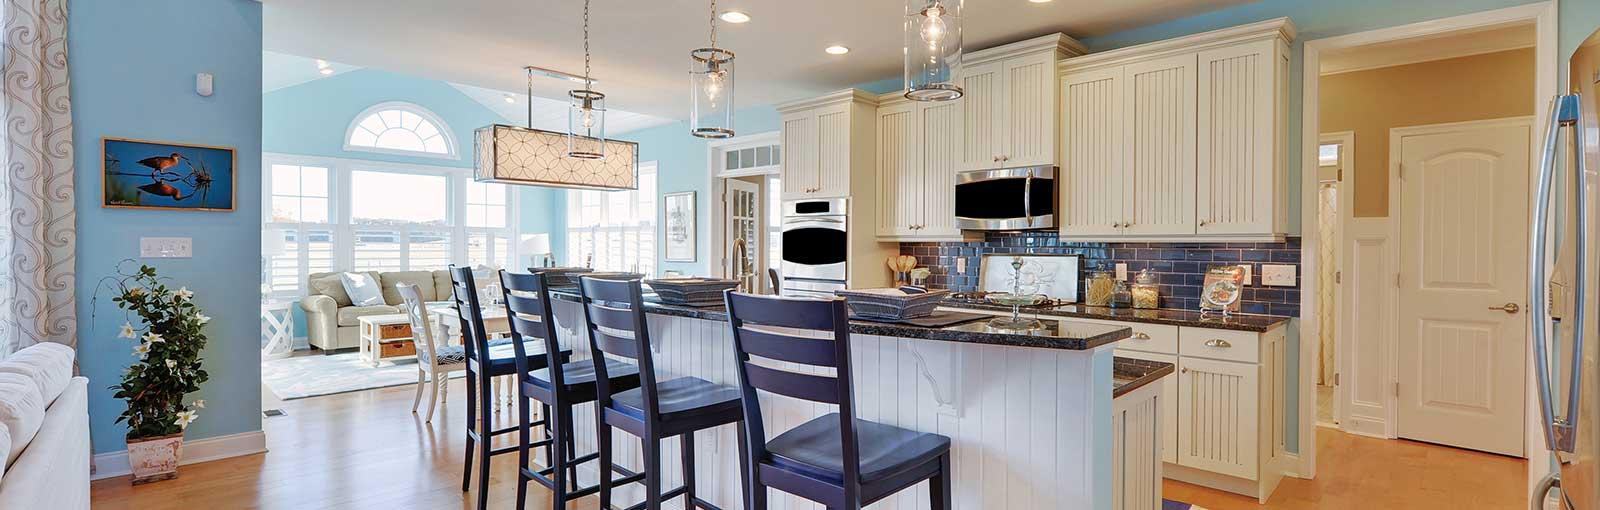 Kitchen scene featuring Aspire cabinets